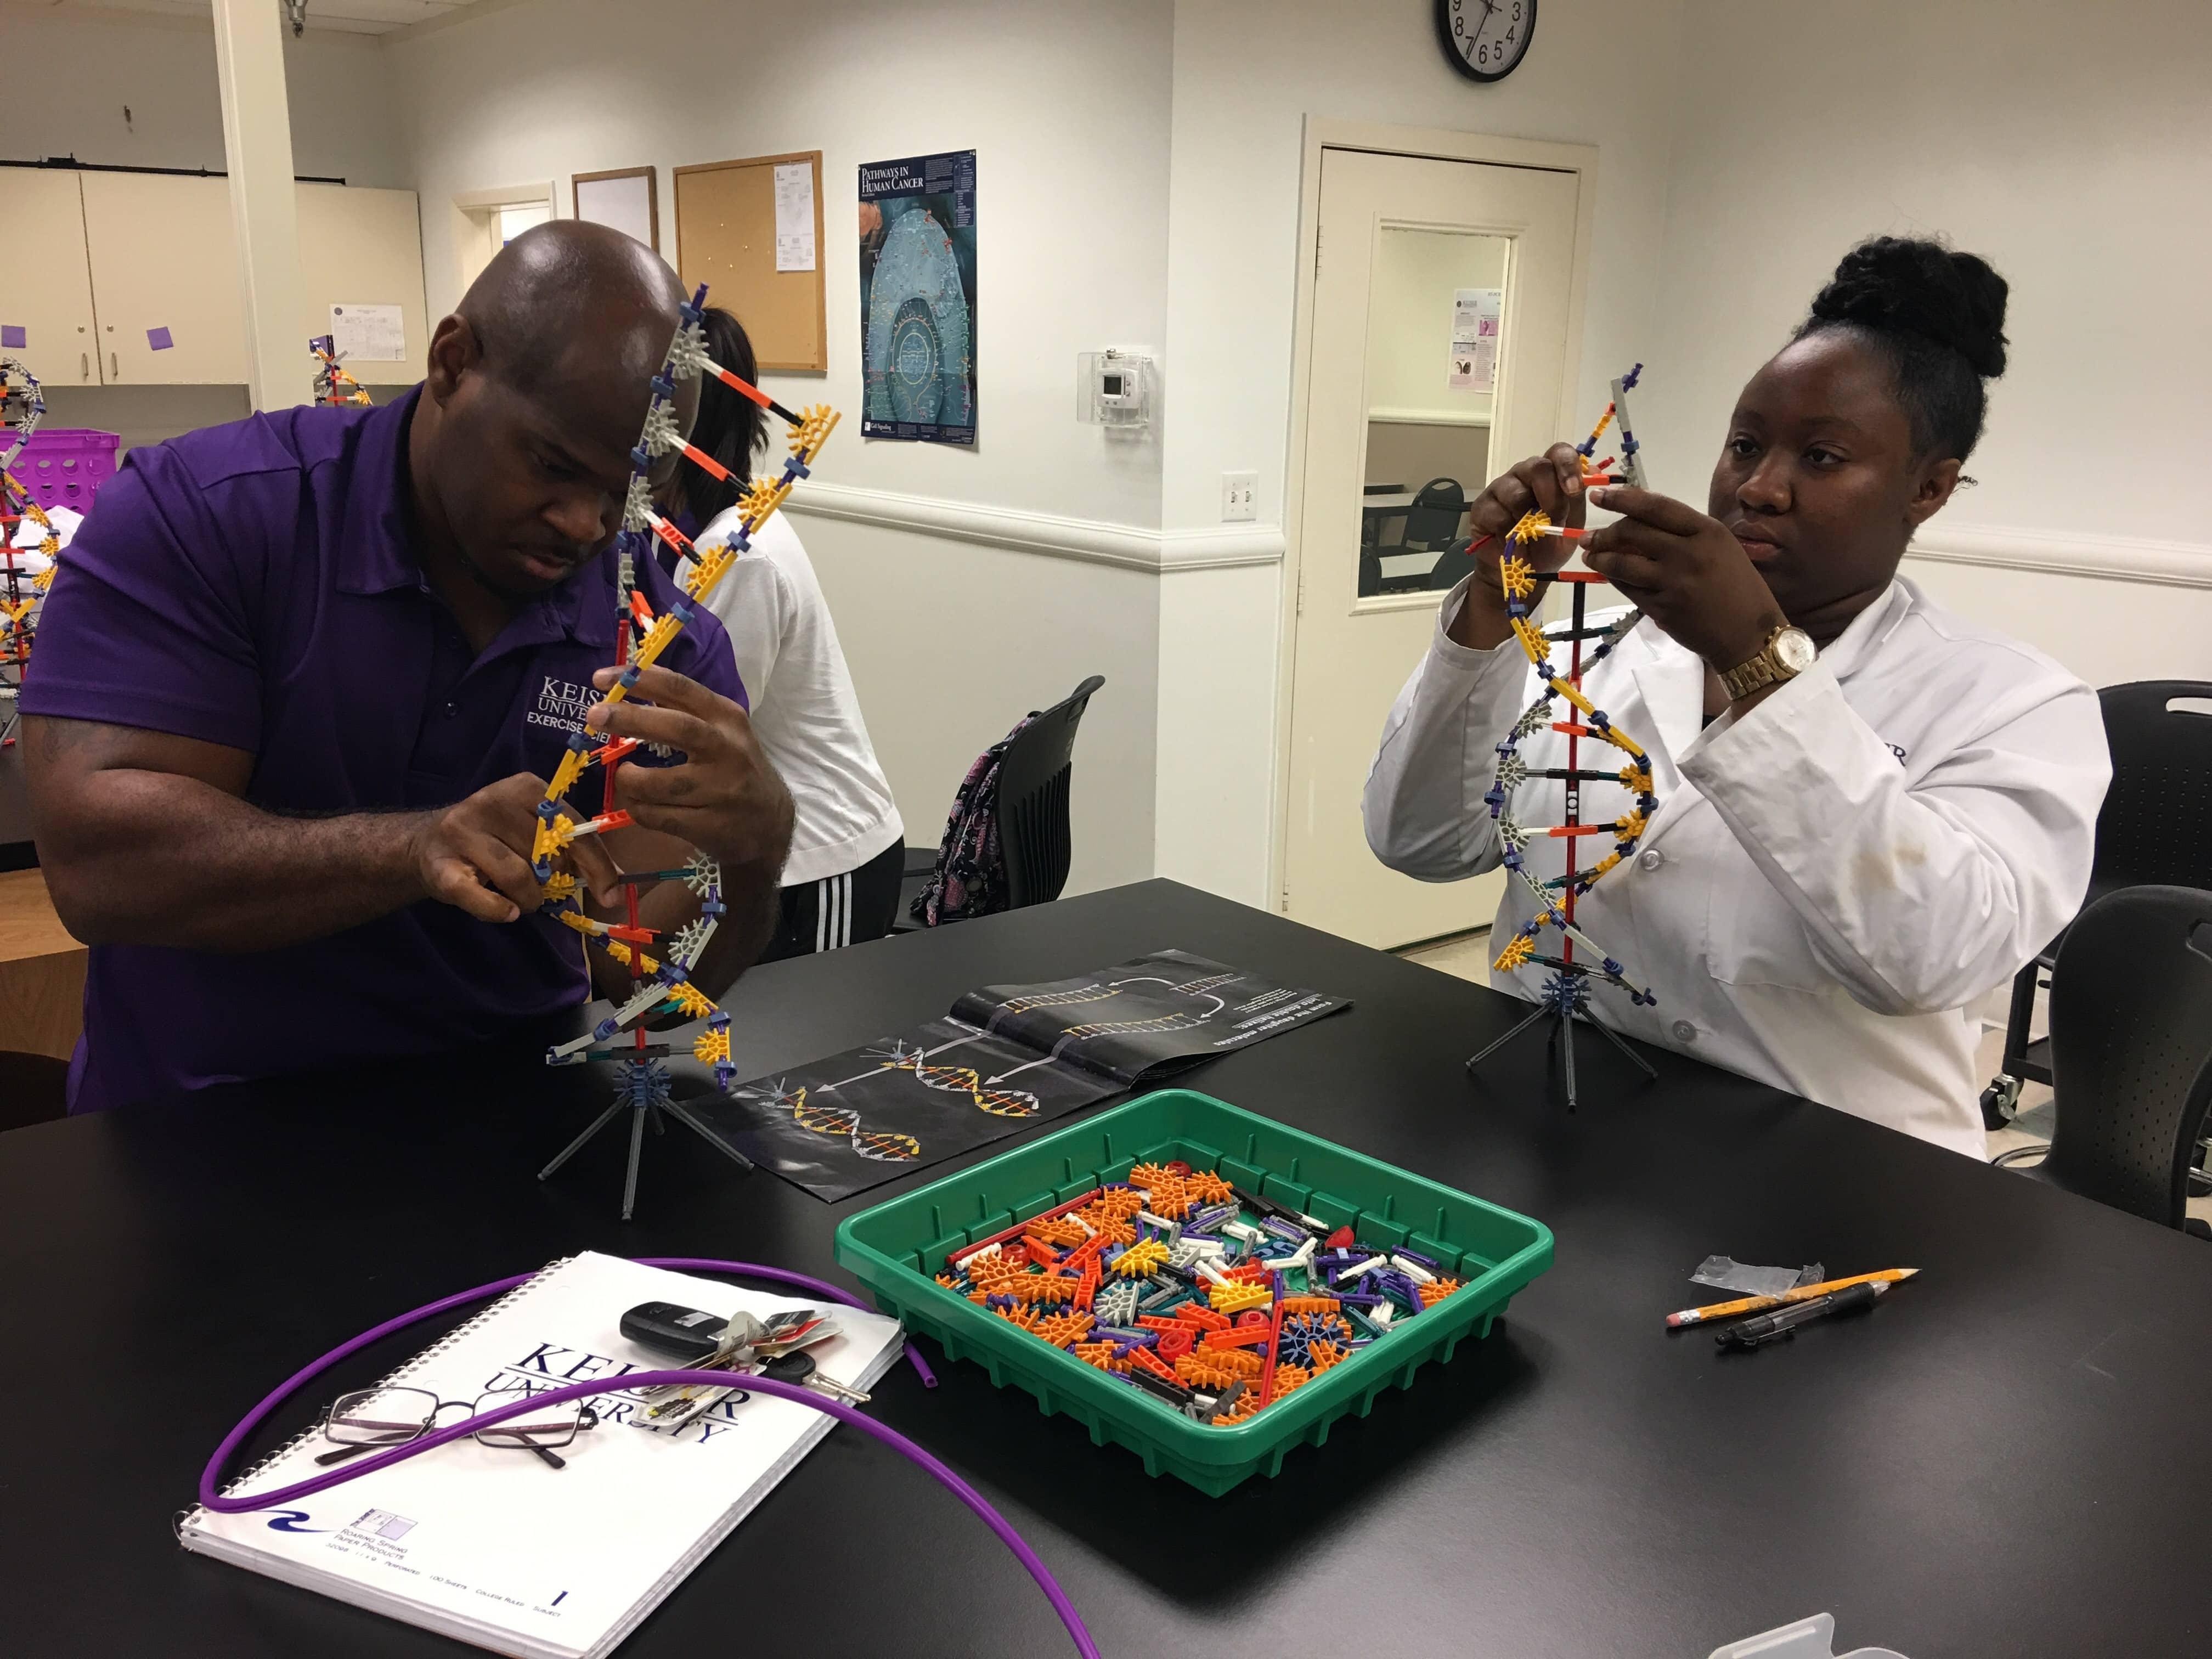 Orlando Students Explore DNA